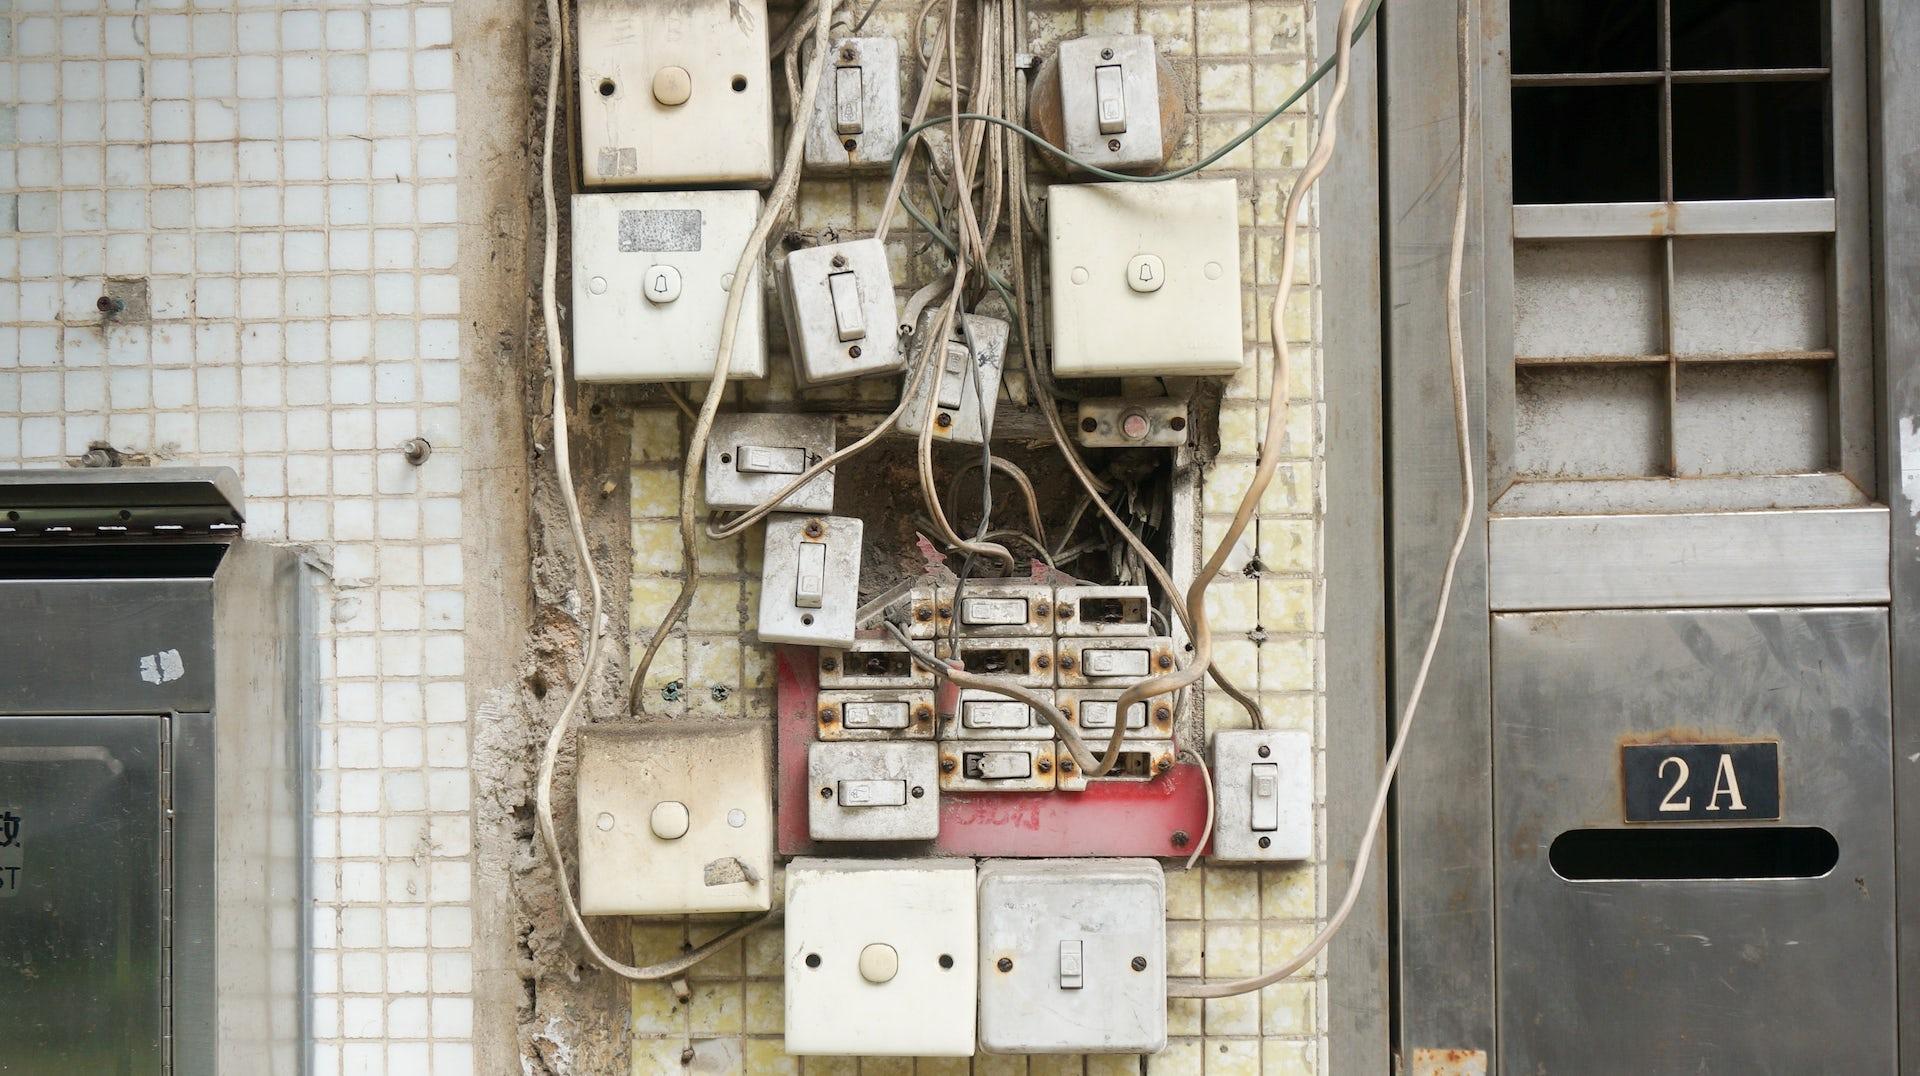 New regulations expose energy price gouging through 'free' comparison sites